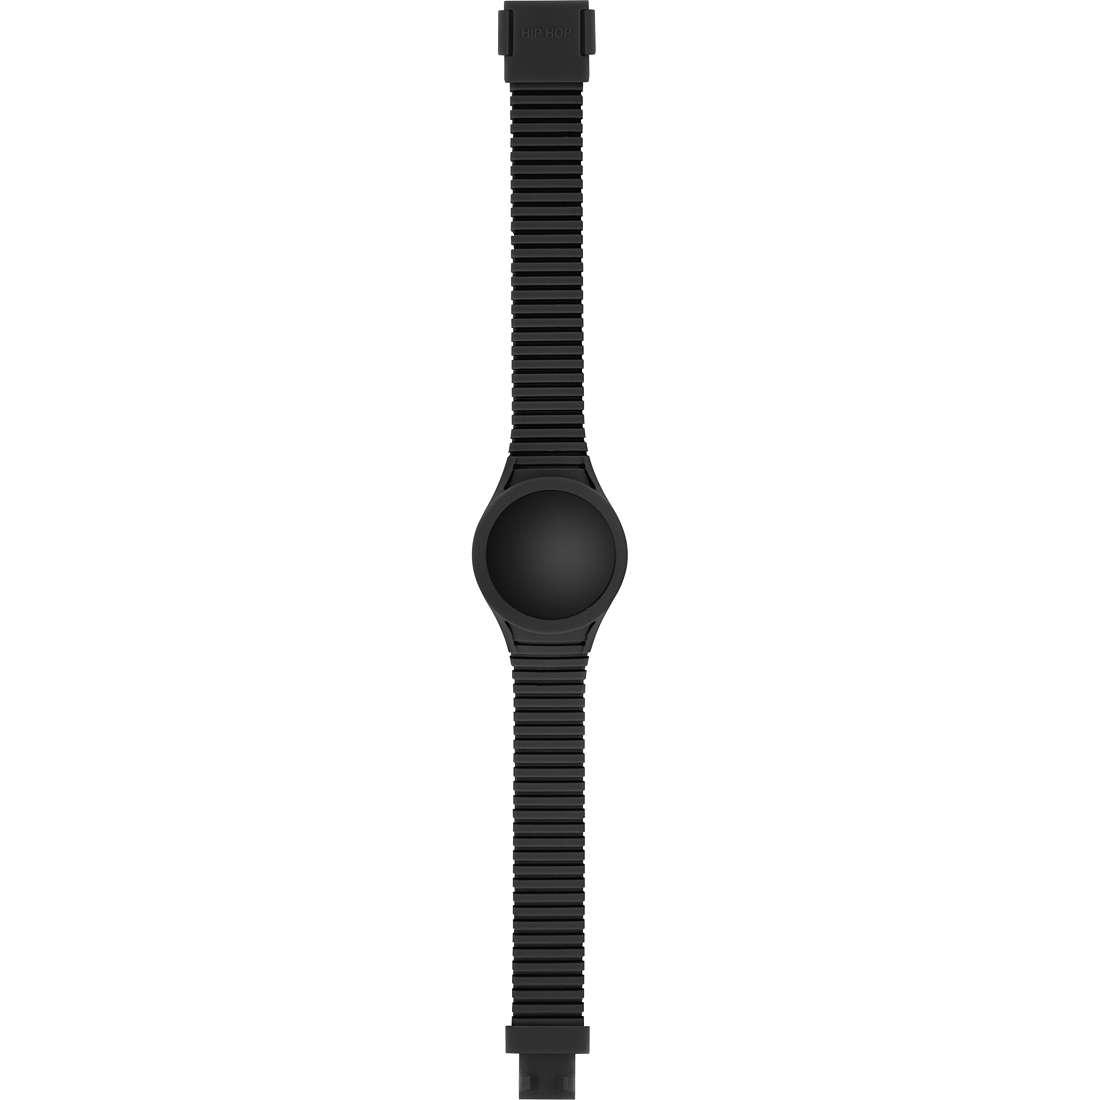 orologio accessorio unisex Hip Hop Solar HBU0529